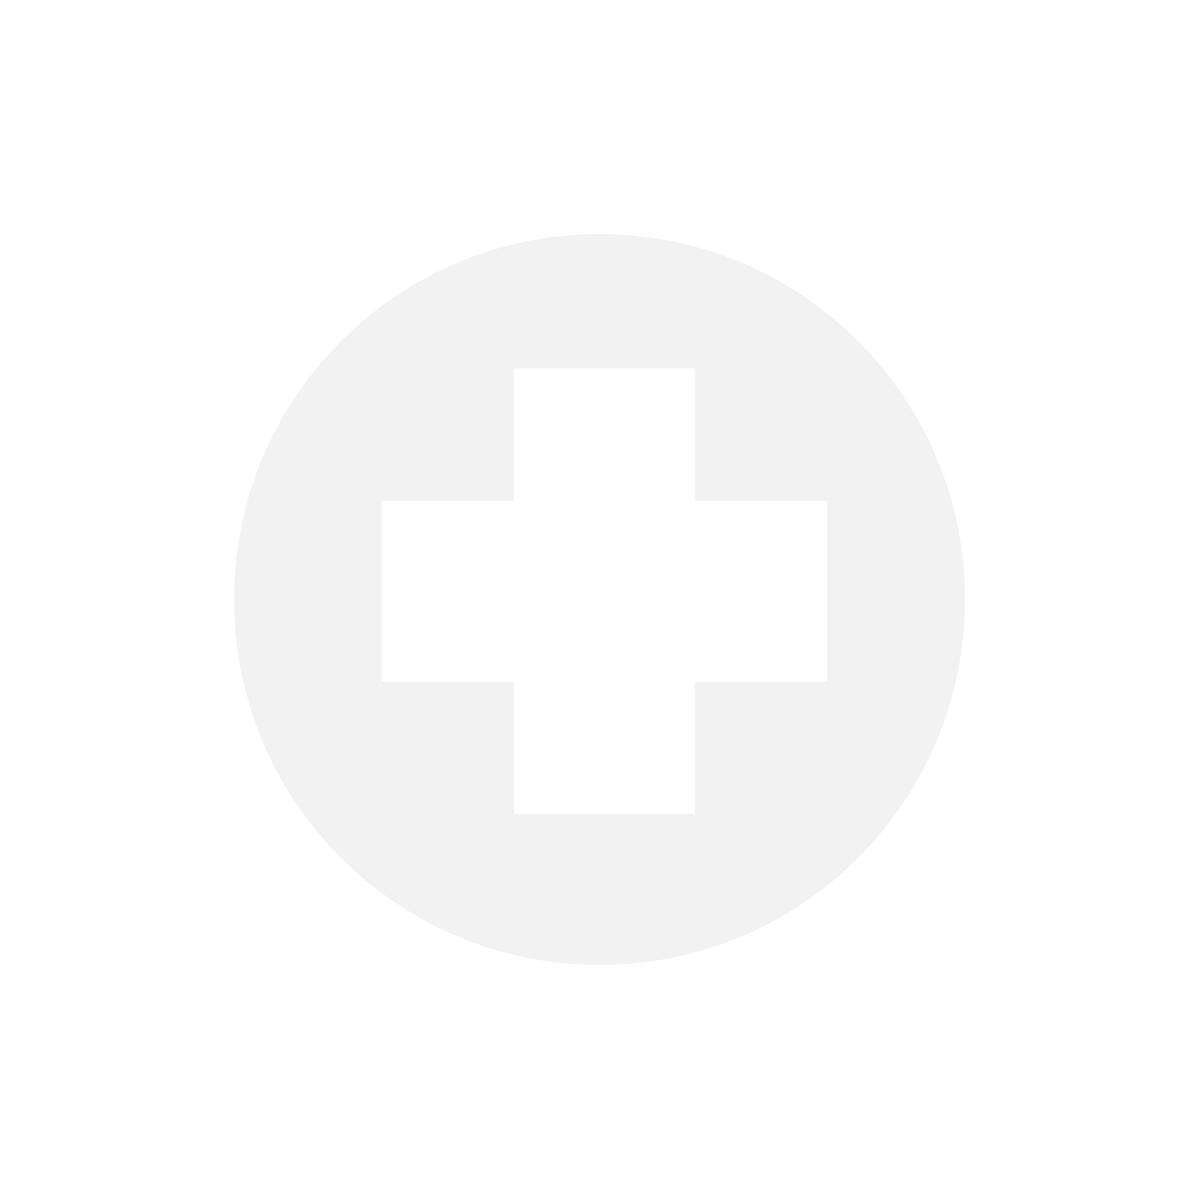 CHATTANOOGA Compresses Sensaflex® Chaud / Froid